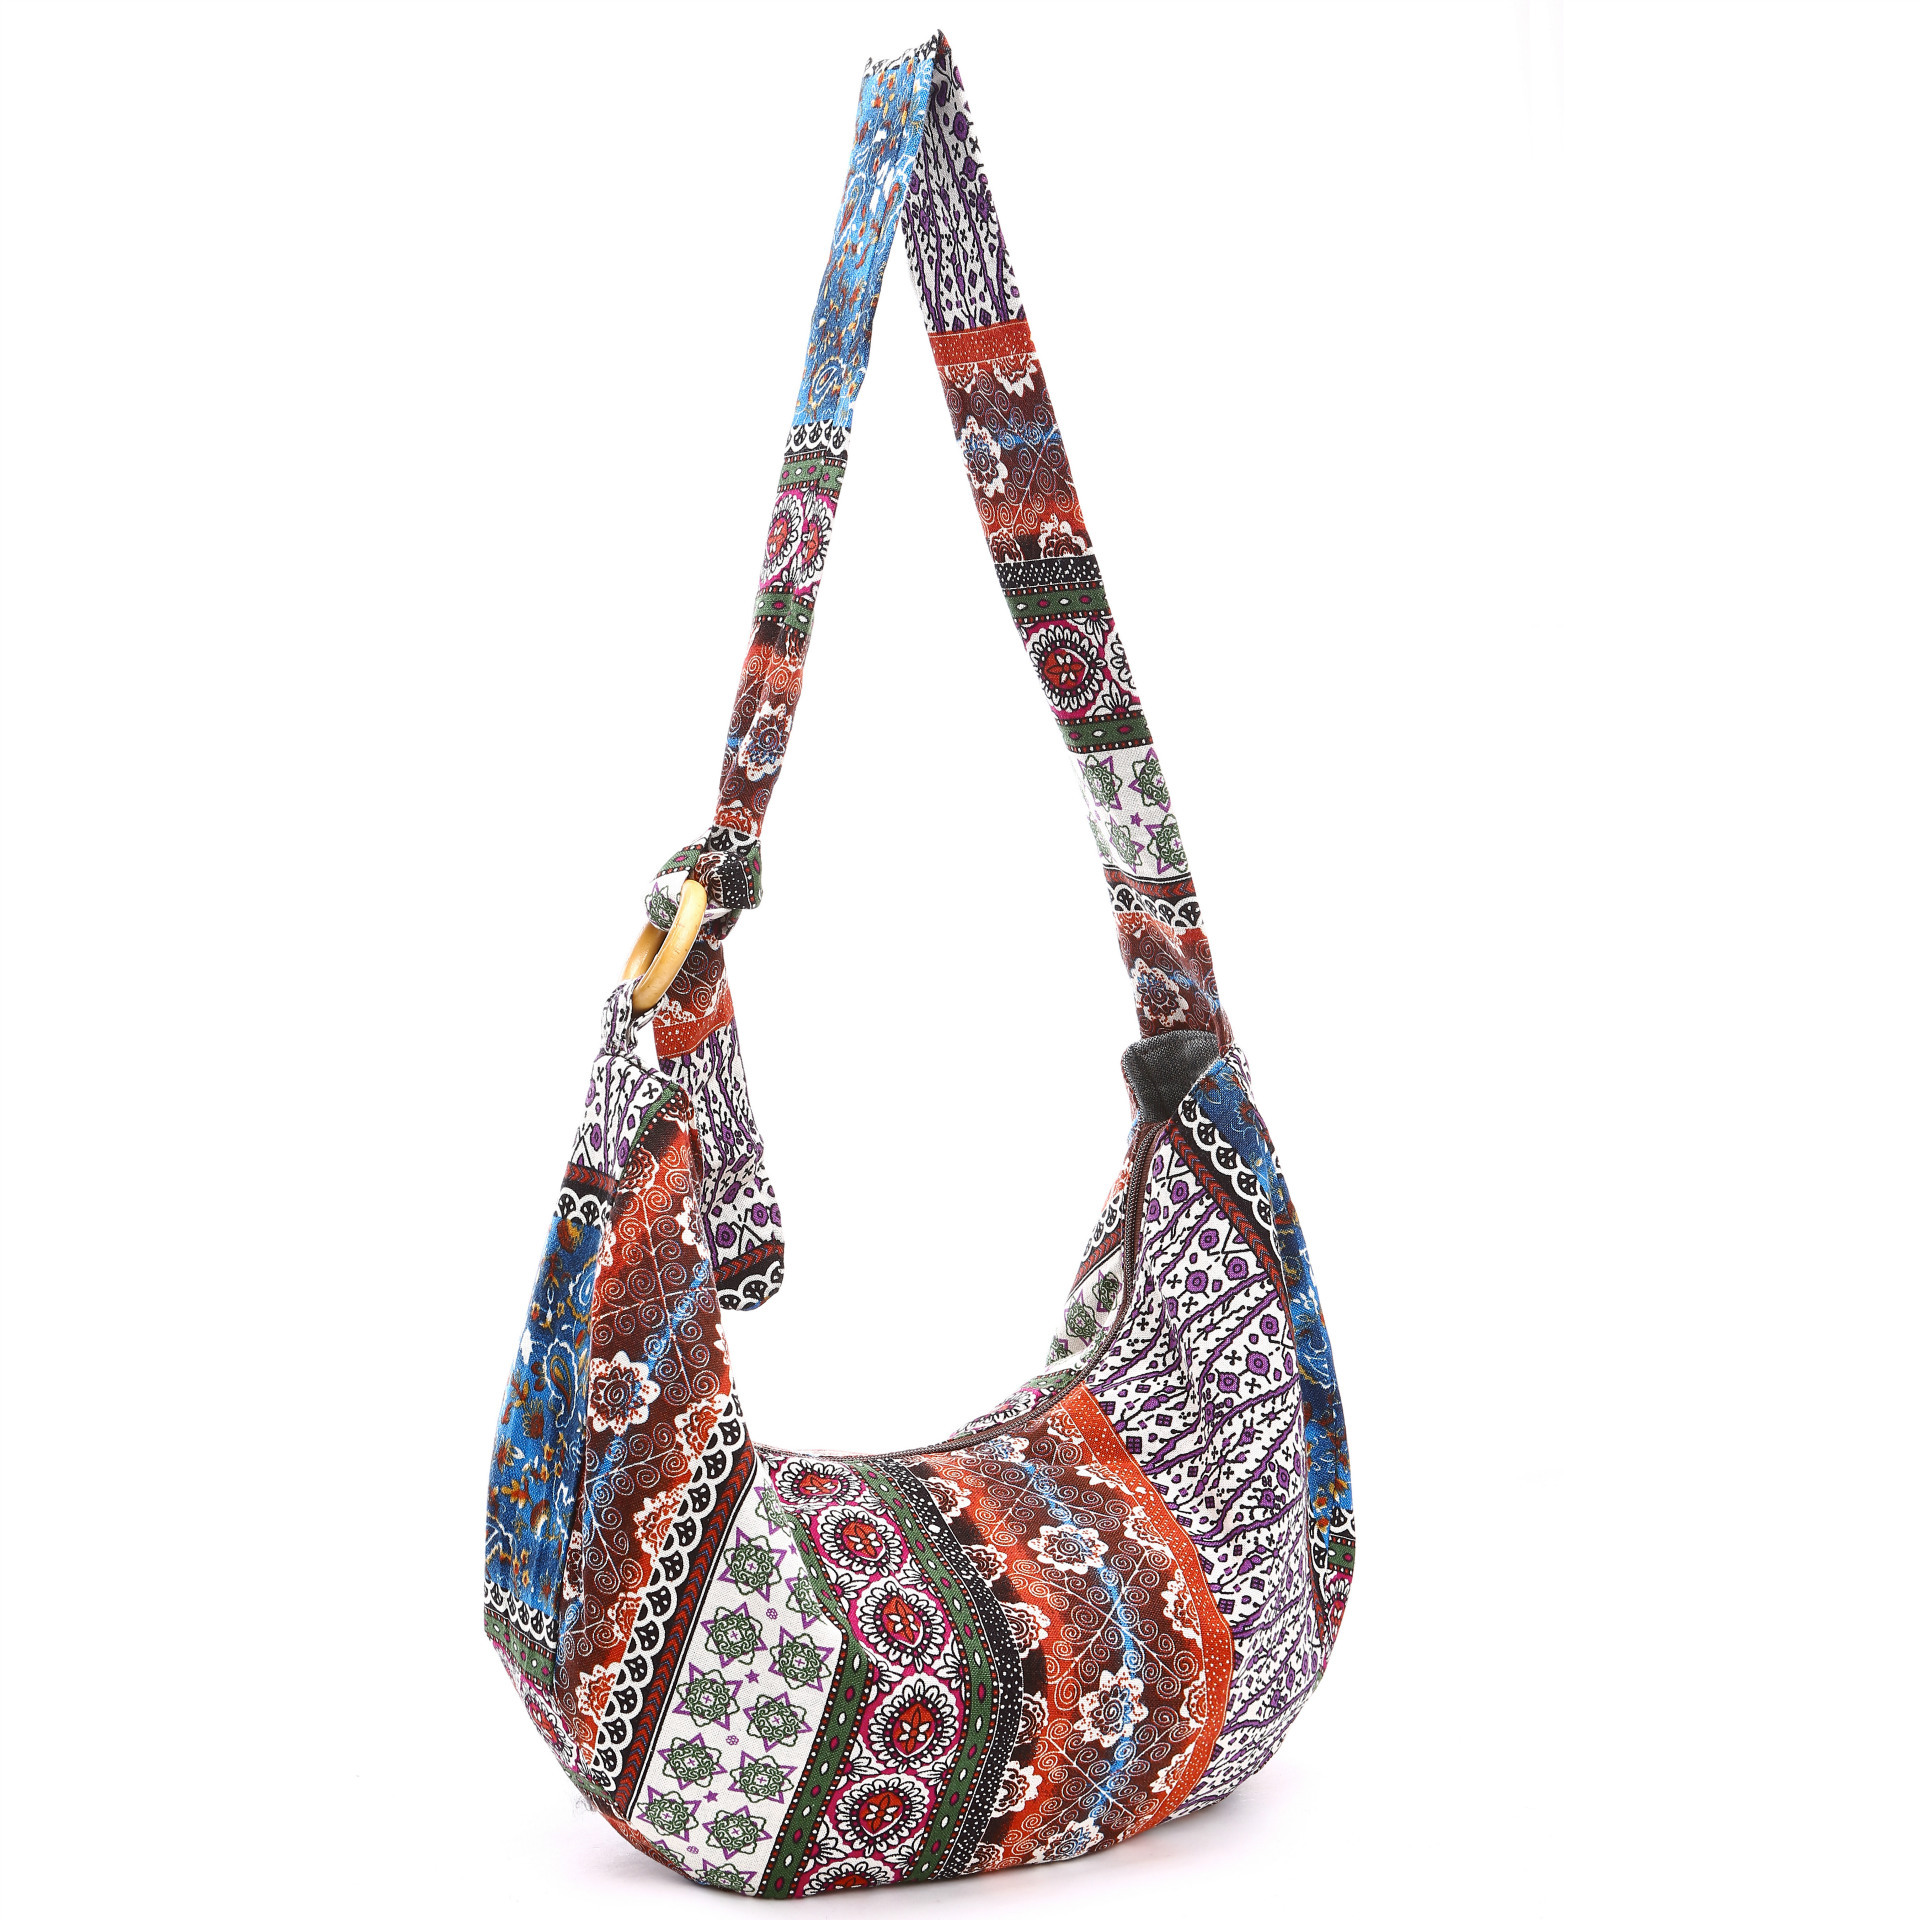 Canvas Broken Flowers Lady's Big Cloth Bag Messenger Bags Slim Crossbody Shoulder Bags Handbag Small Cross Body Bags-15